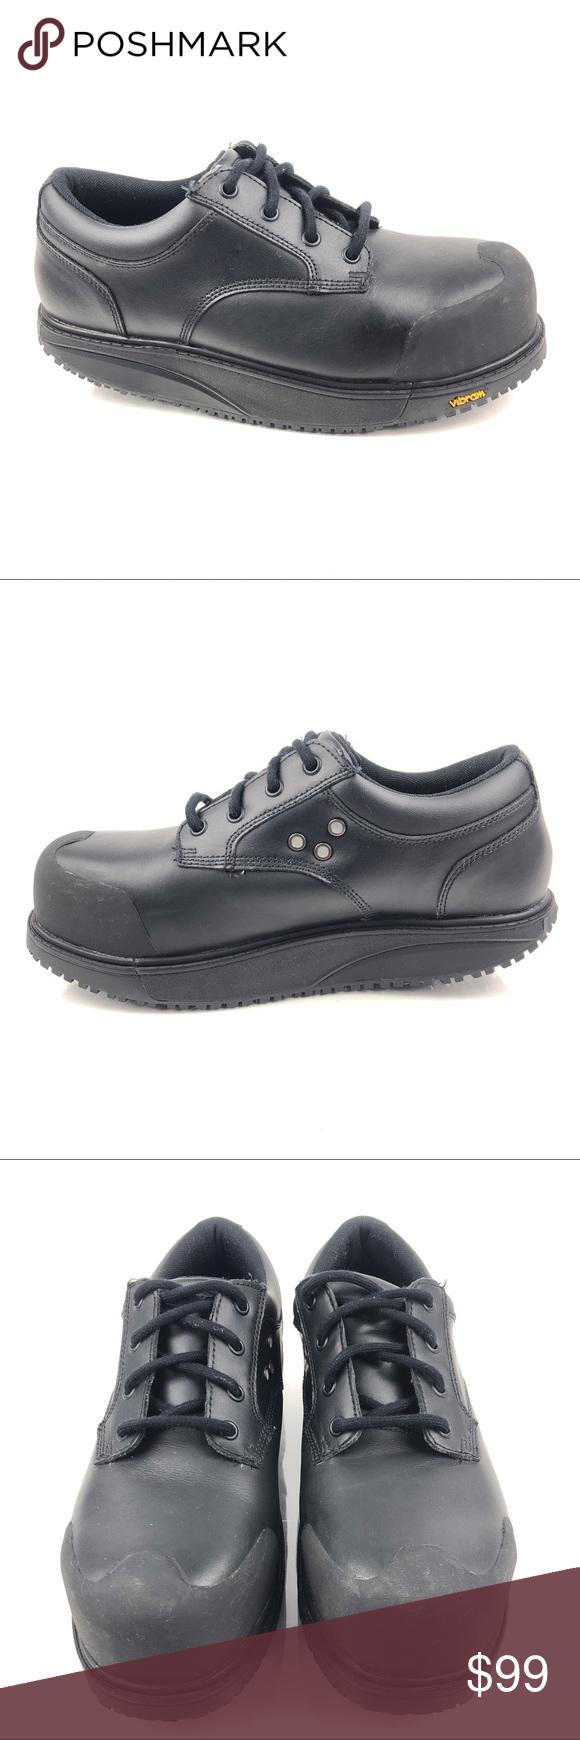 MBT Unisex Omega Steel Toe Safety Work Shoes MBT Unisex